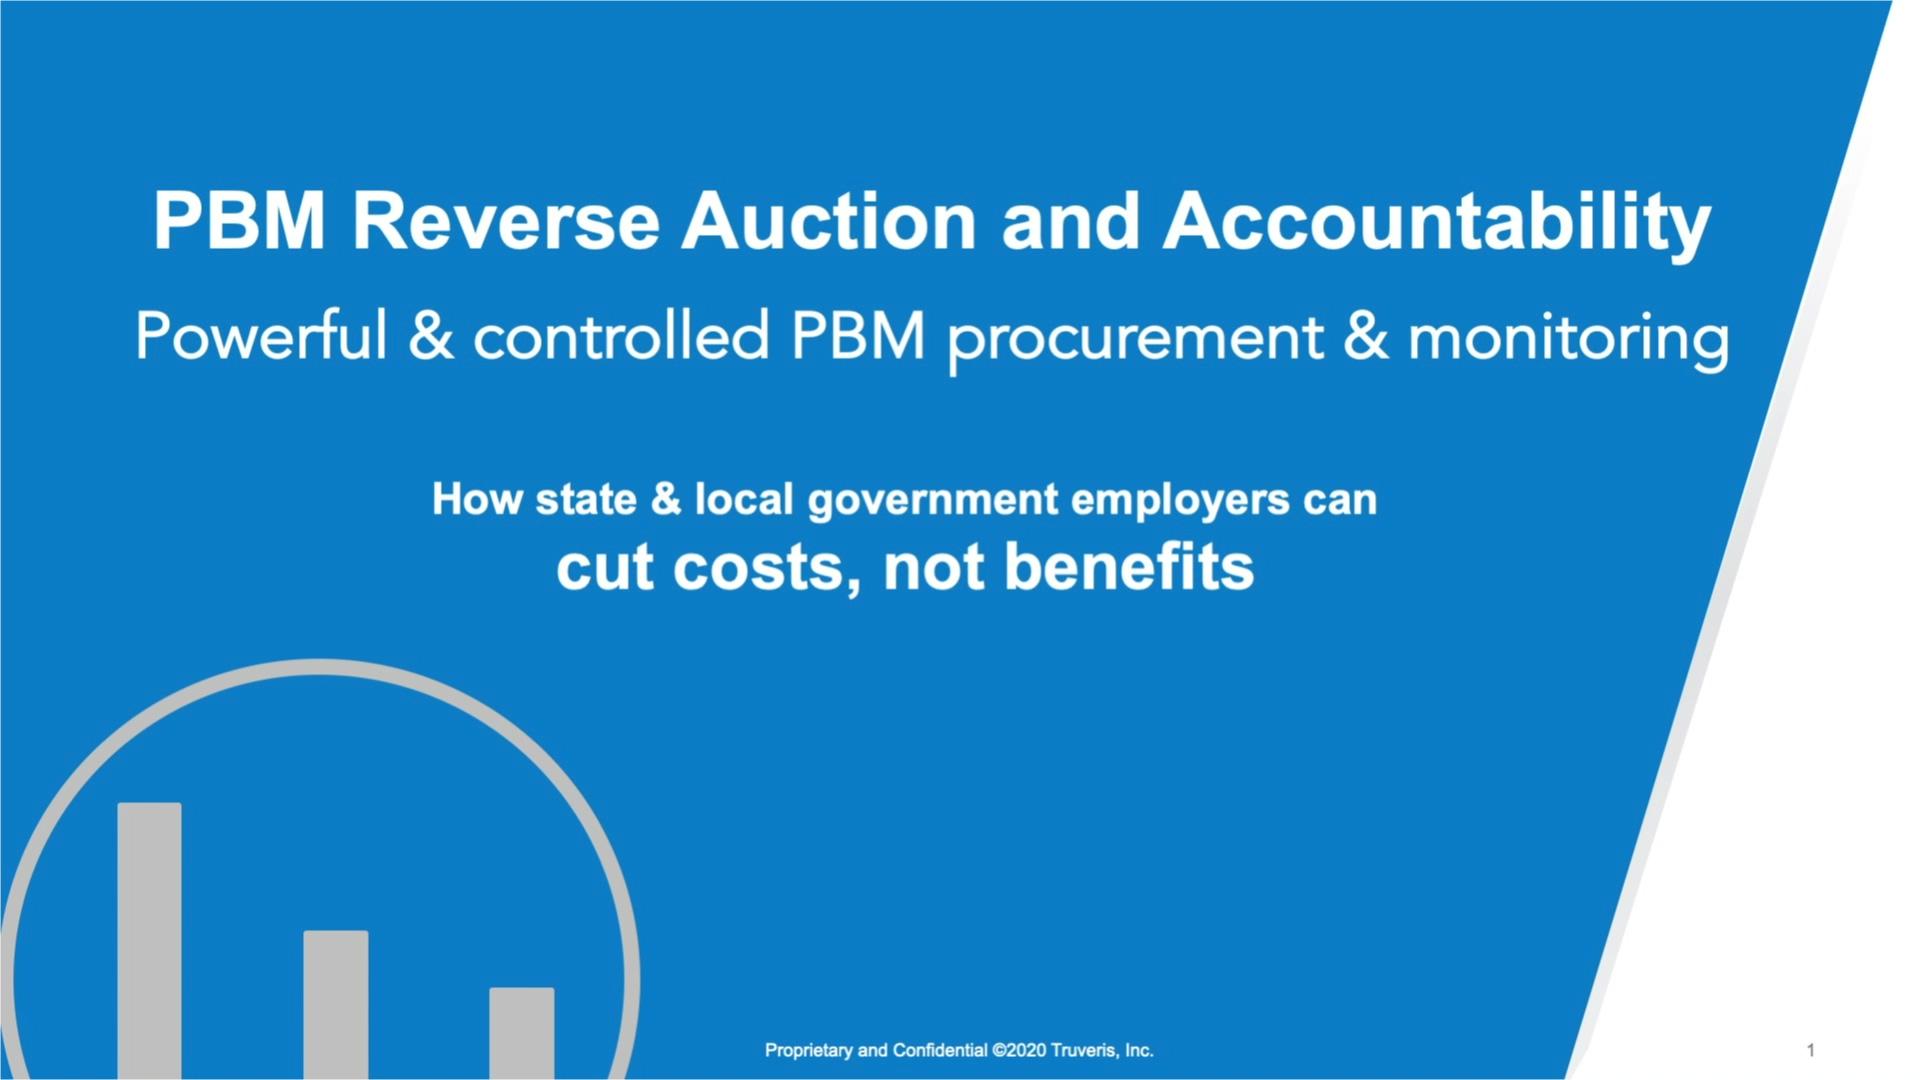 PBM Reverse Auction